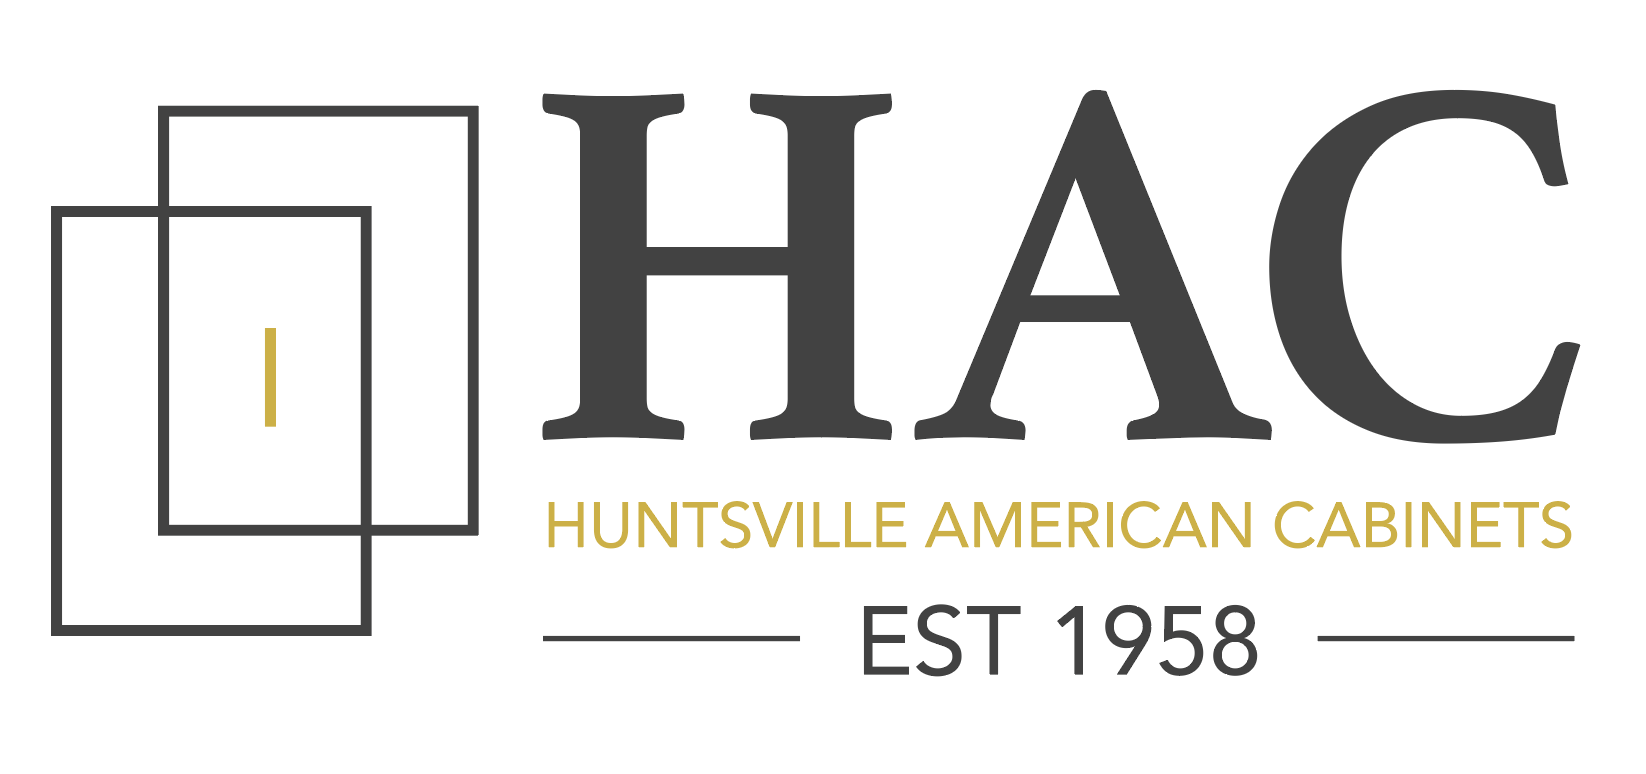 Huntsville American Cabinets